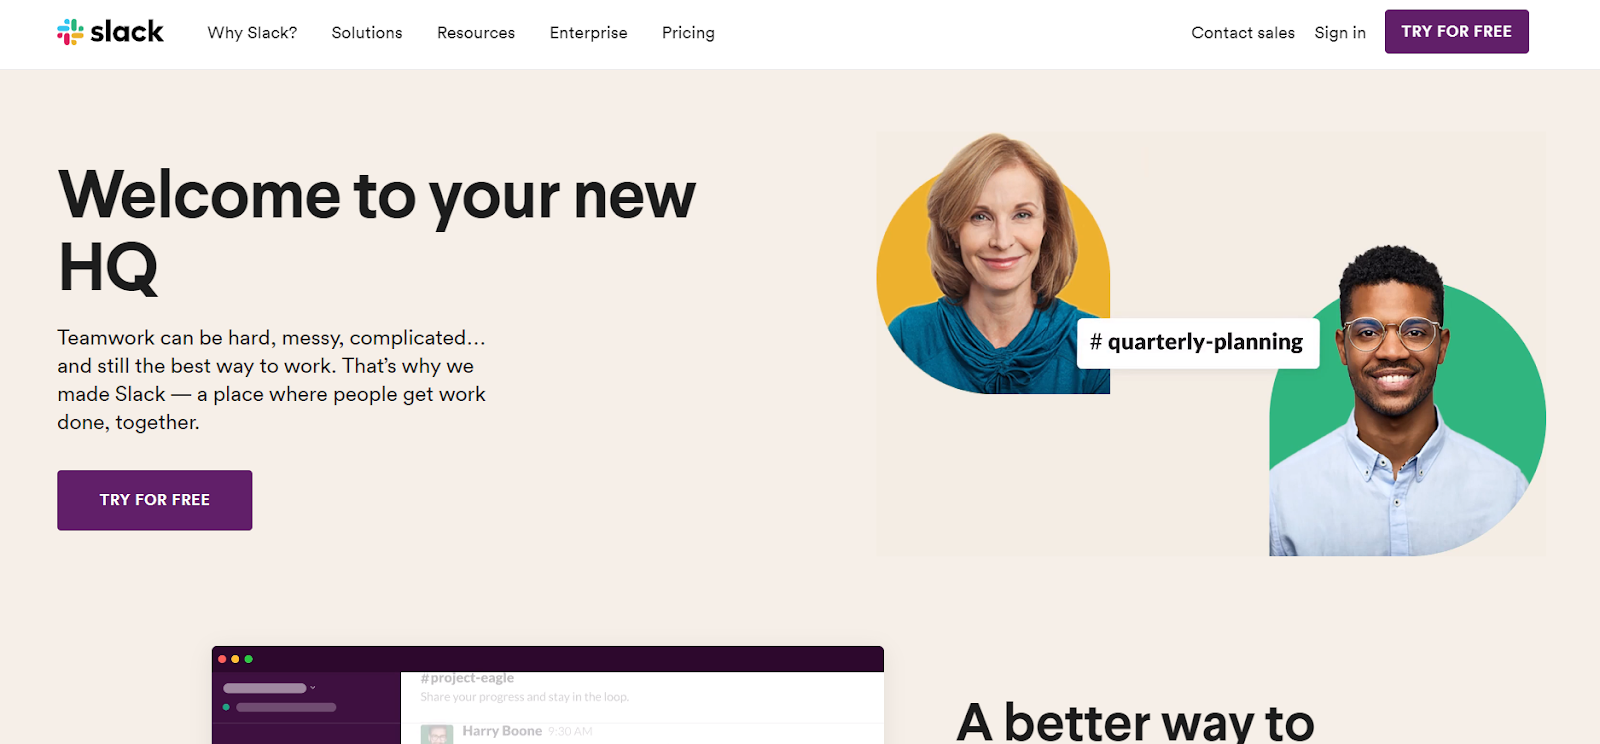 Slack product page design